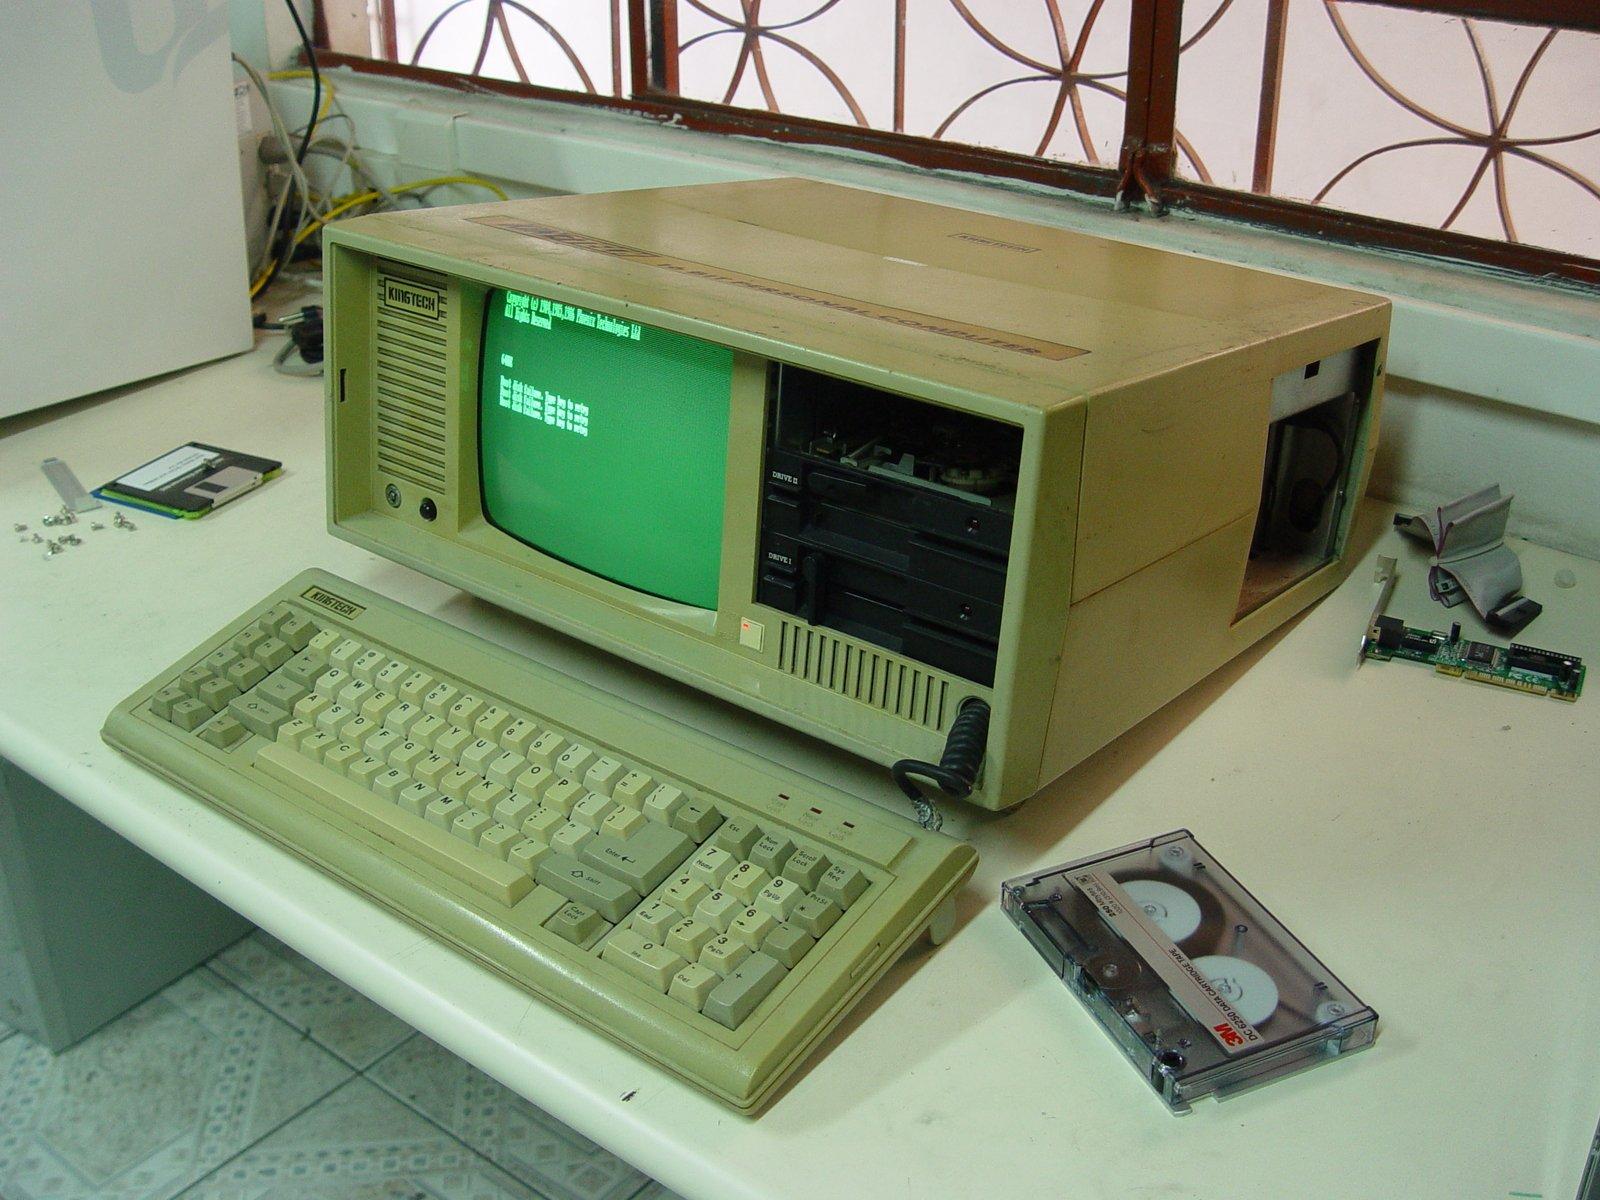 Grandcomputer